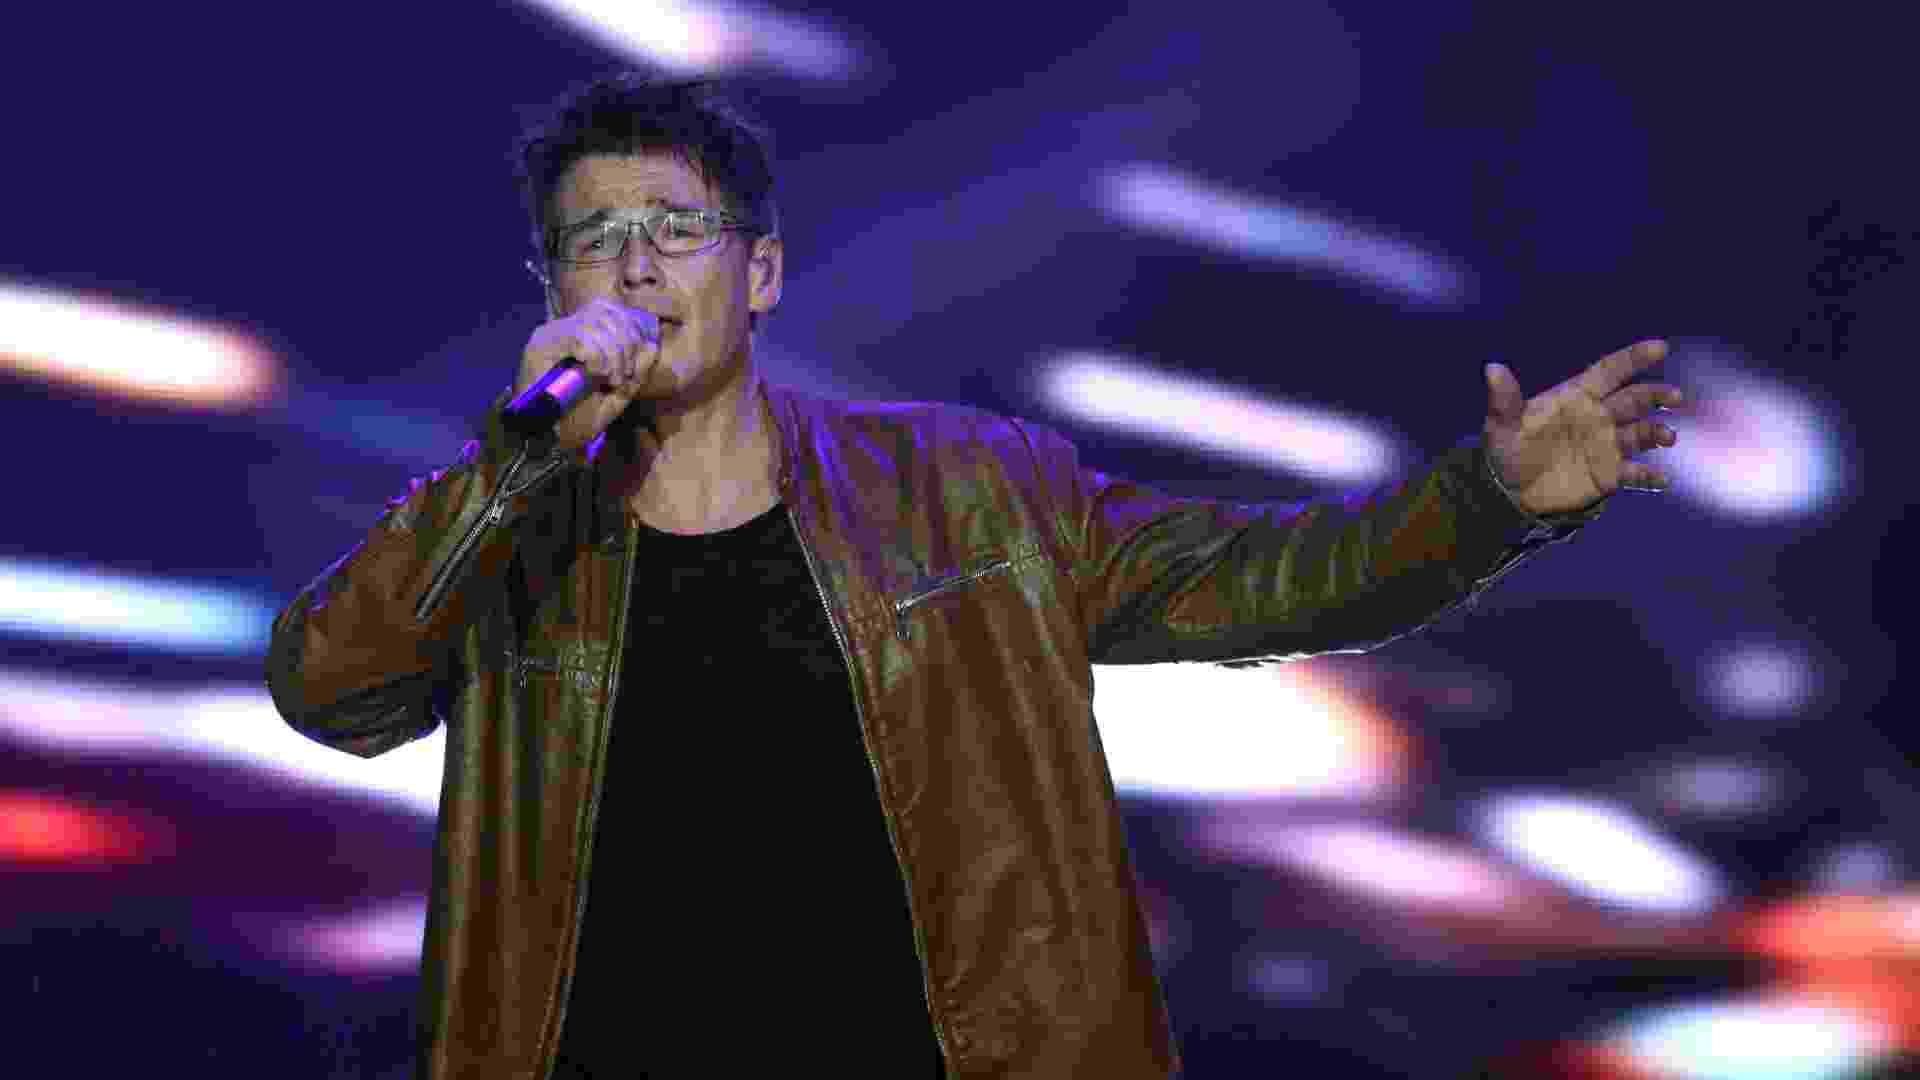 27.set.2015 - A banda norueguesa A-ha se apresenta no palco Mundo no último dia do Rock in Rio 2015 - Fernando Maia/UOL